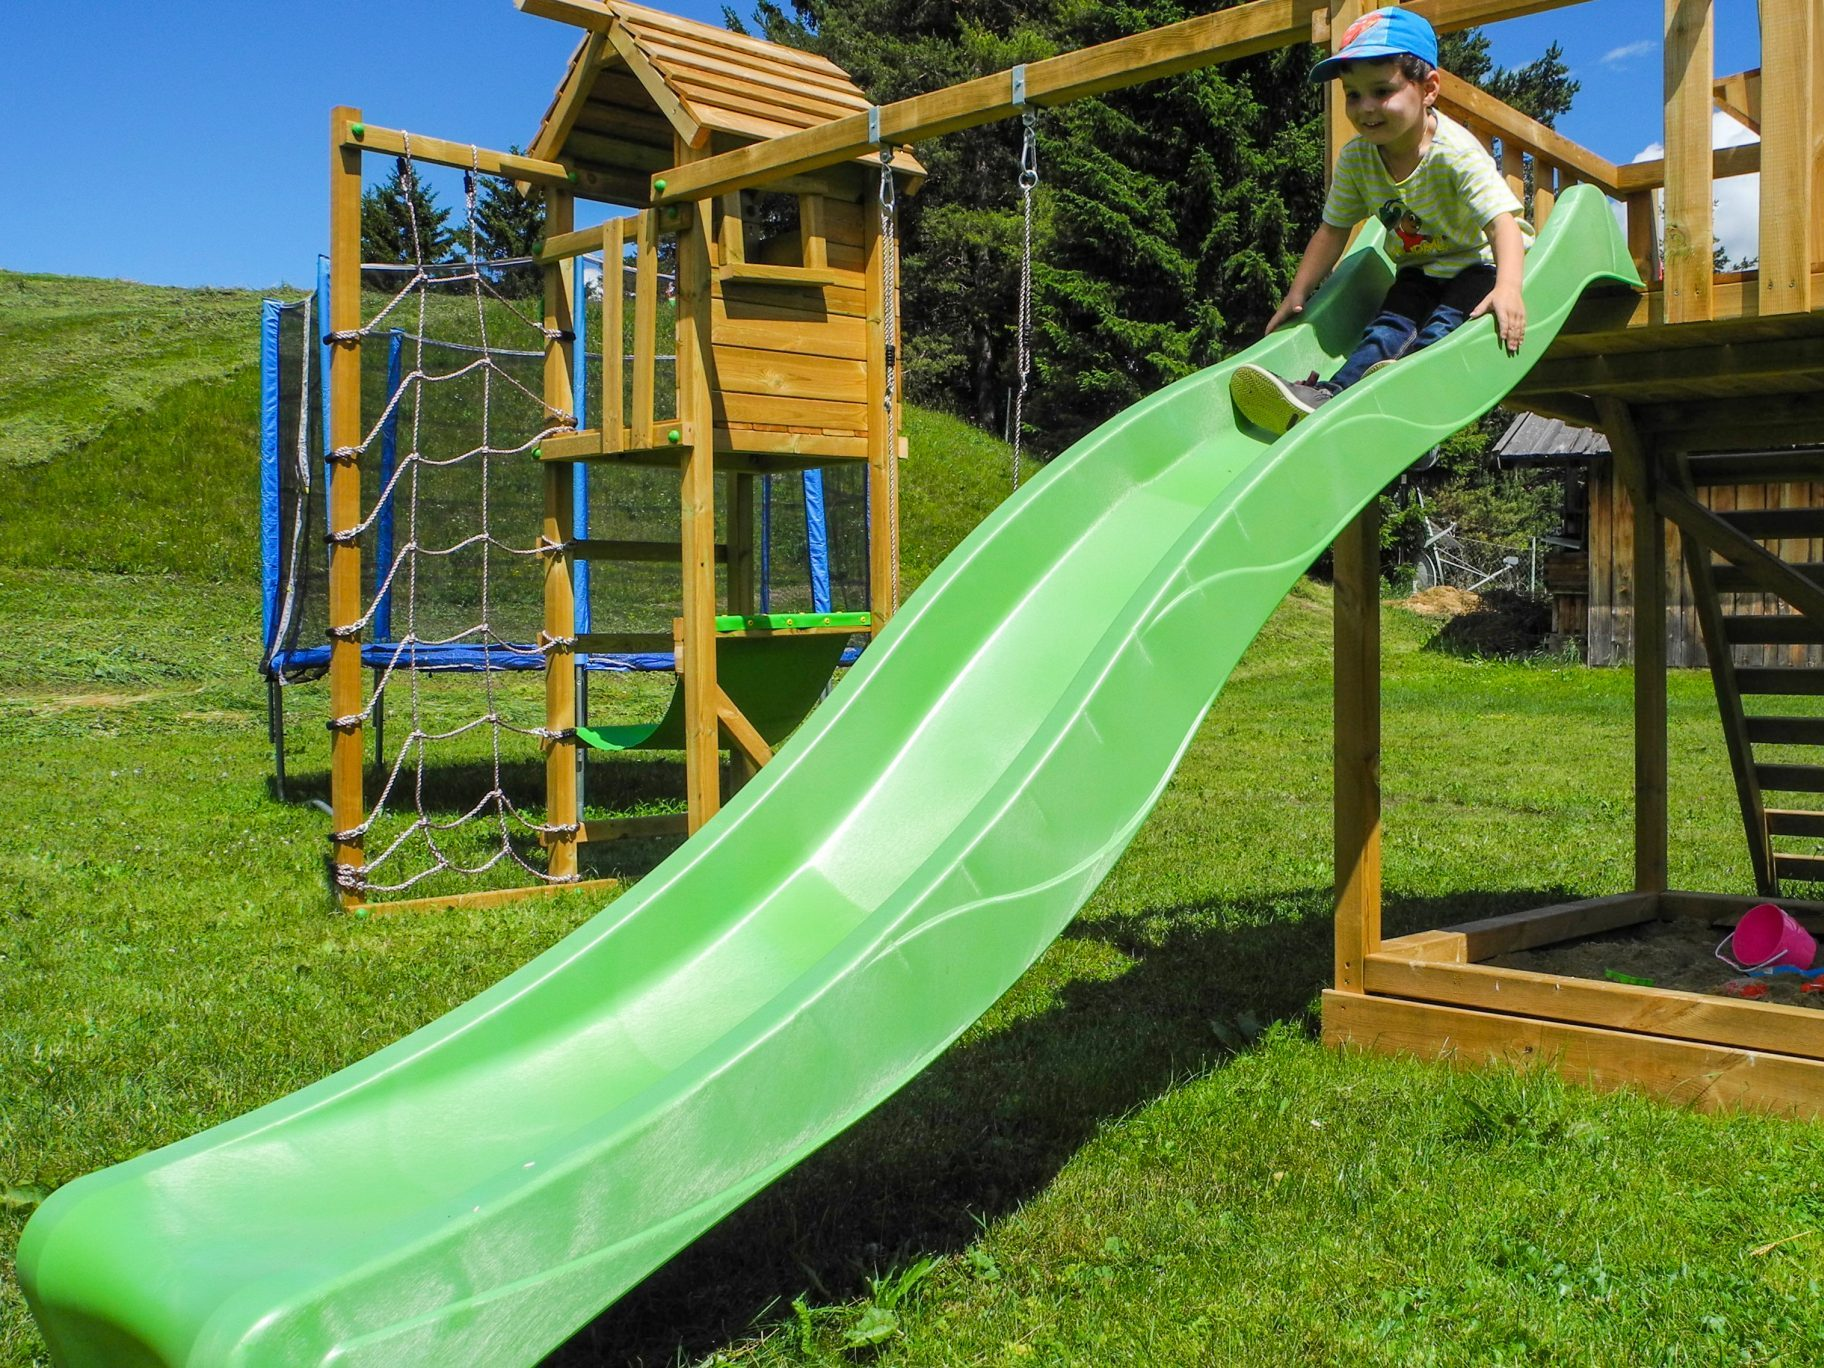 Sulla Collina, garden, playground